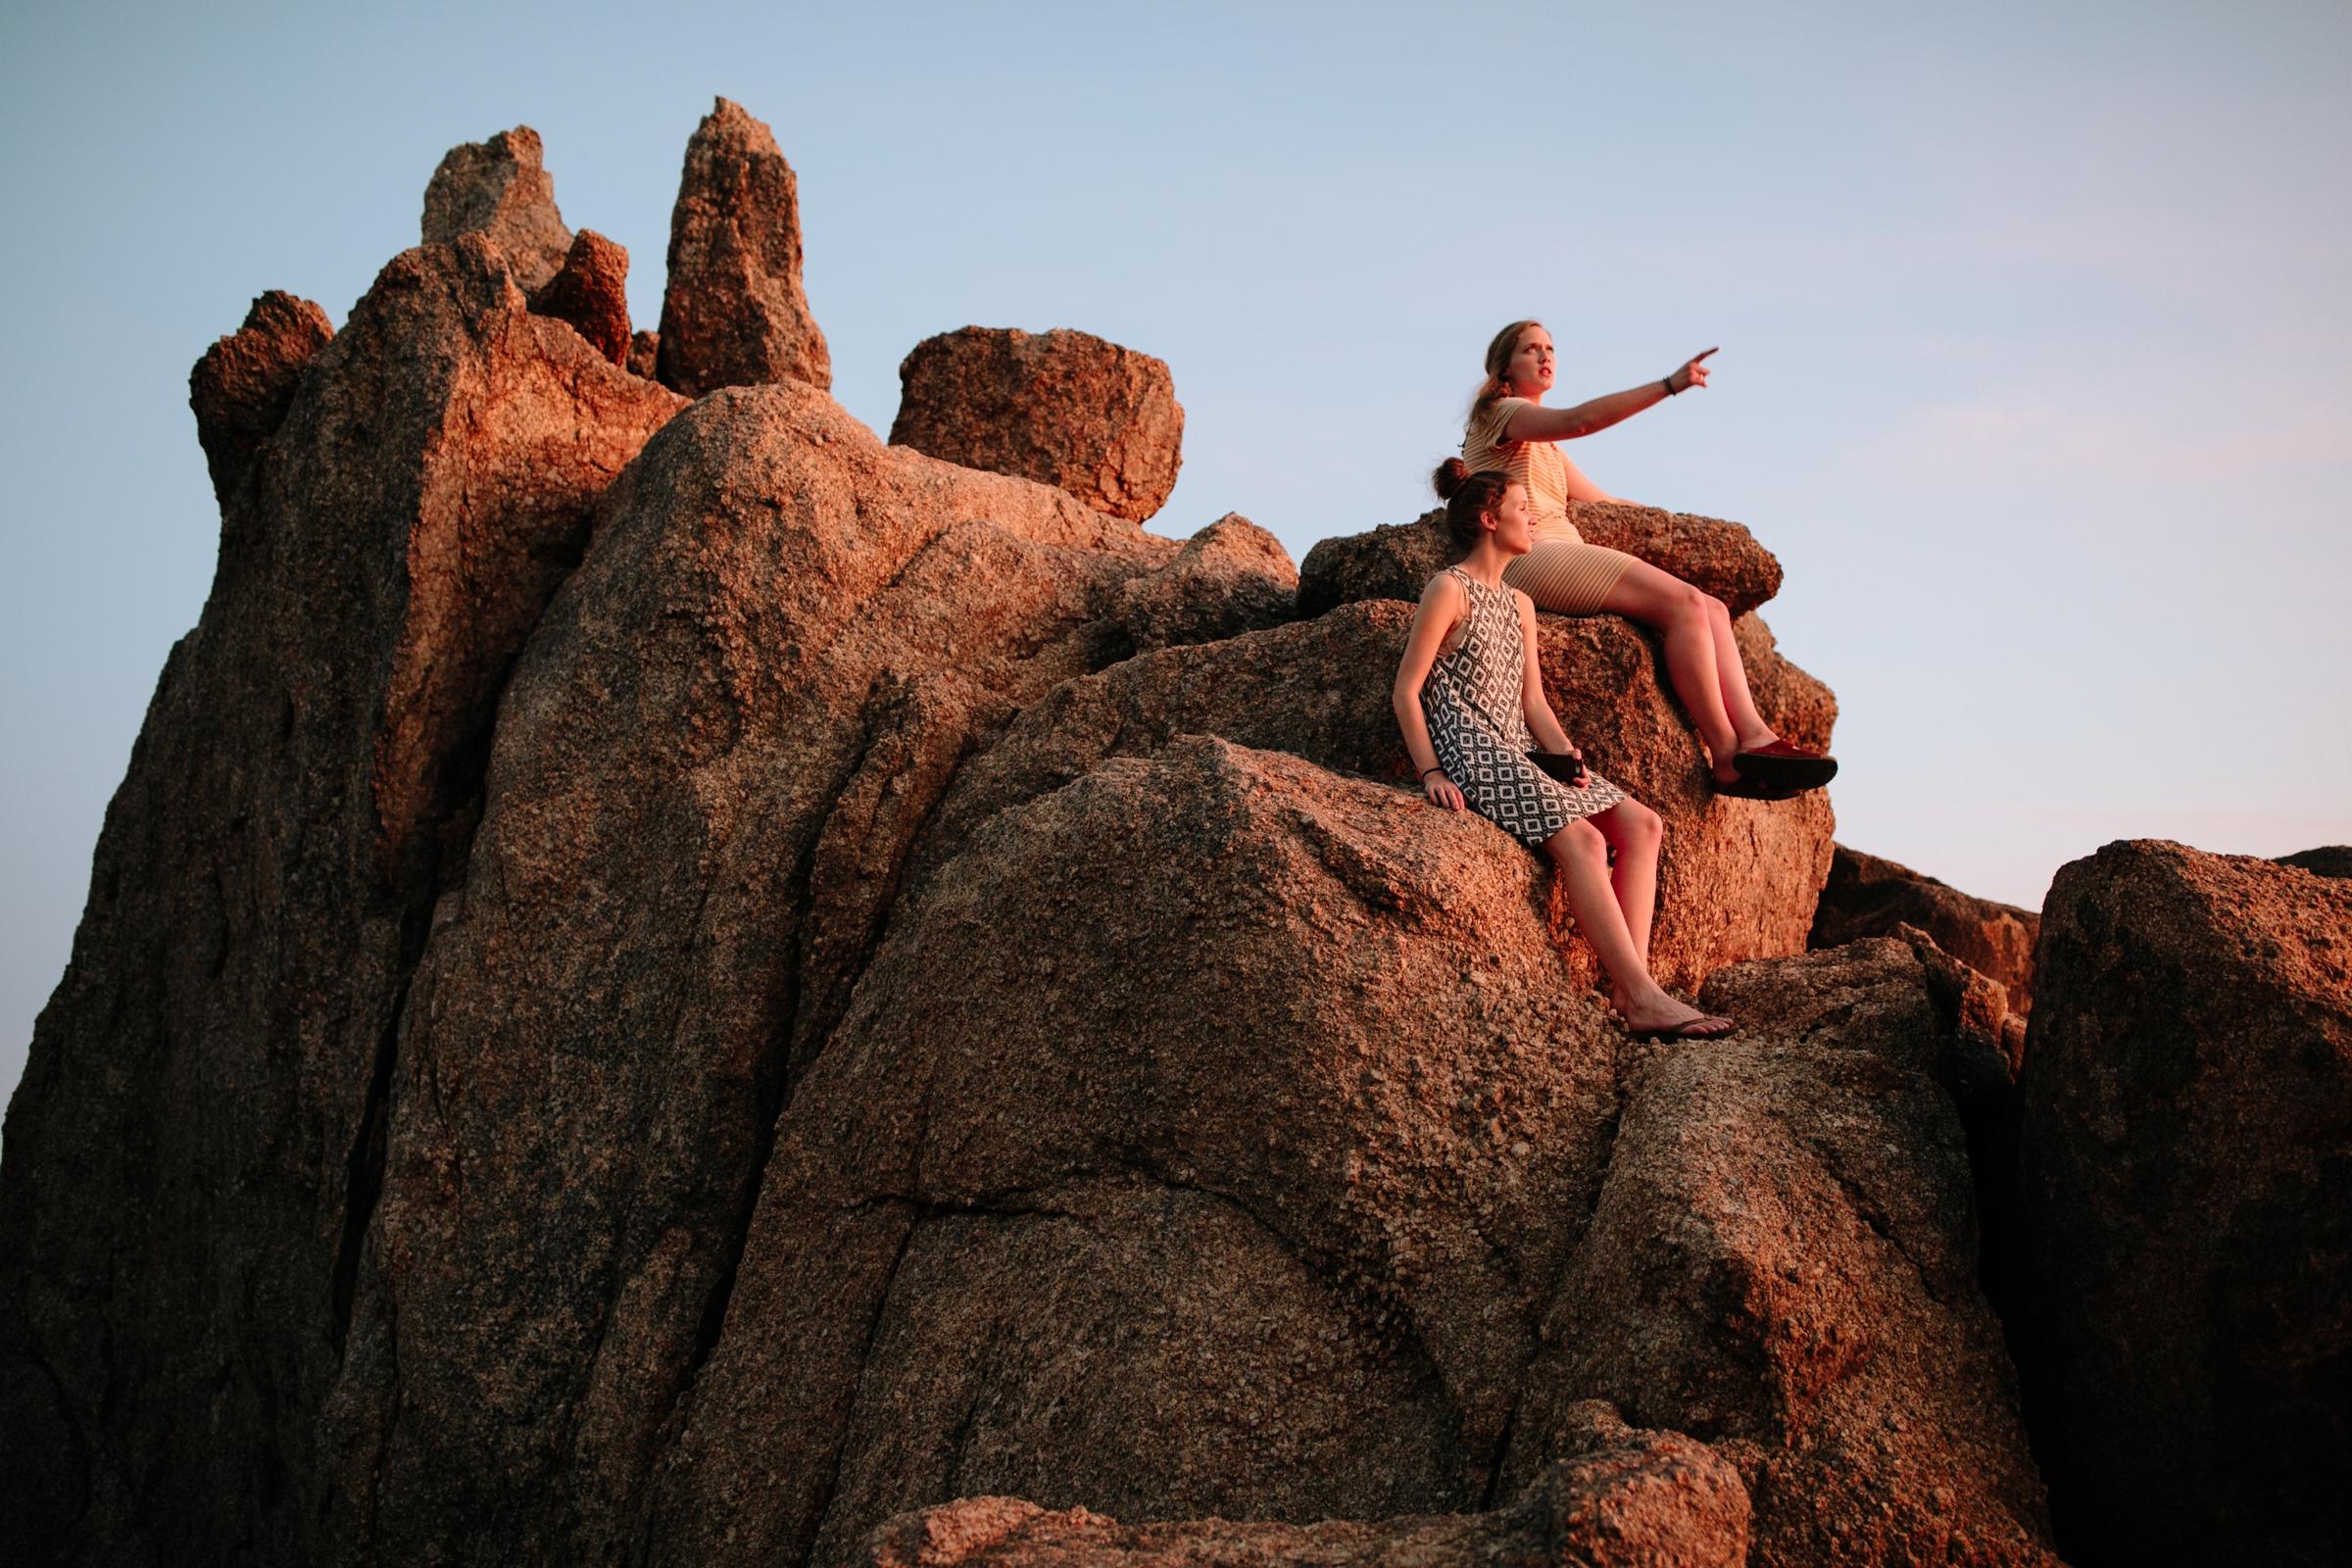 catie-bergman-arizona-southwest-hipster-seattlefamily-seattle-family-pnw-first-birthday-lifestylephotography-catie-bergman-photography-elopement-landscape-travel-wedding-pnw-portrait-lifestylephotography-vsco-northwest-friends-love_0014.jpg